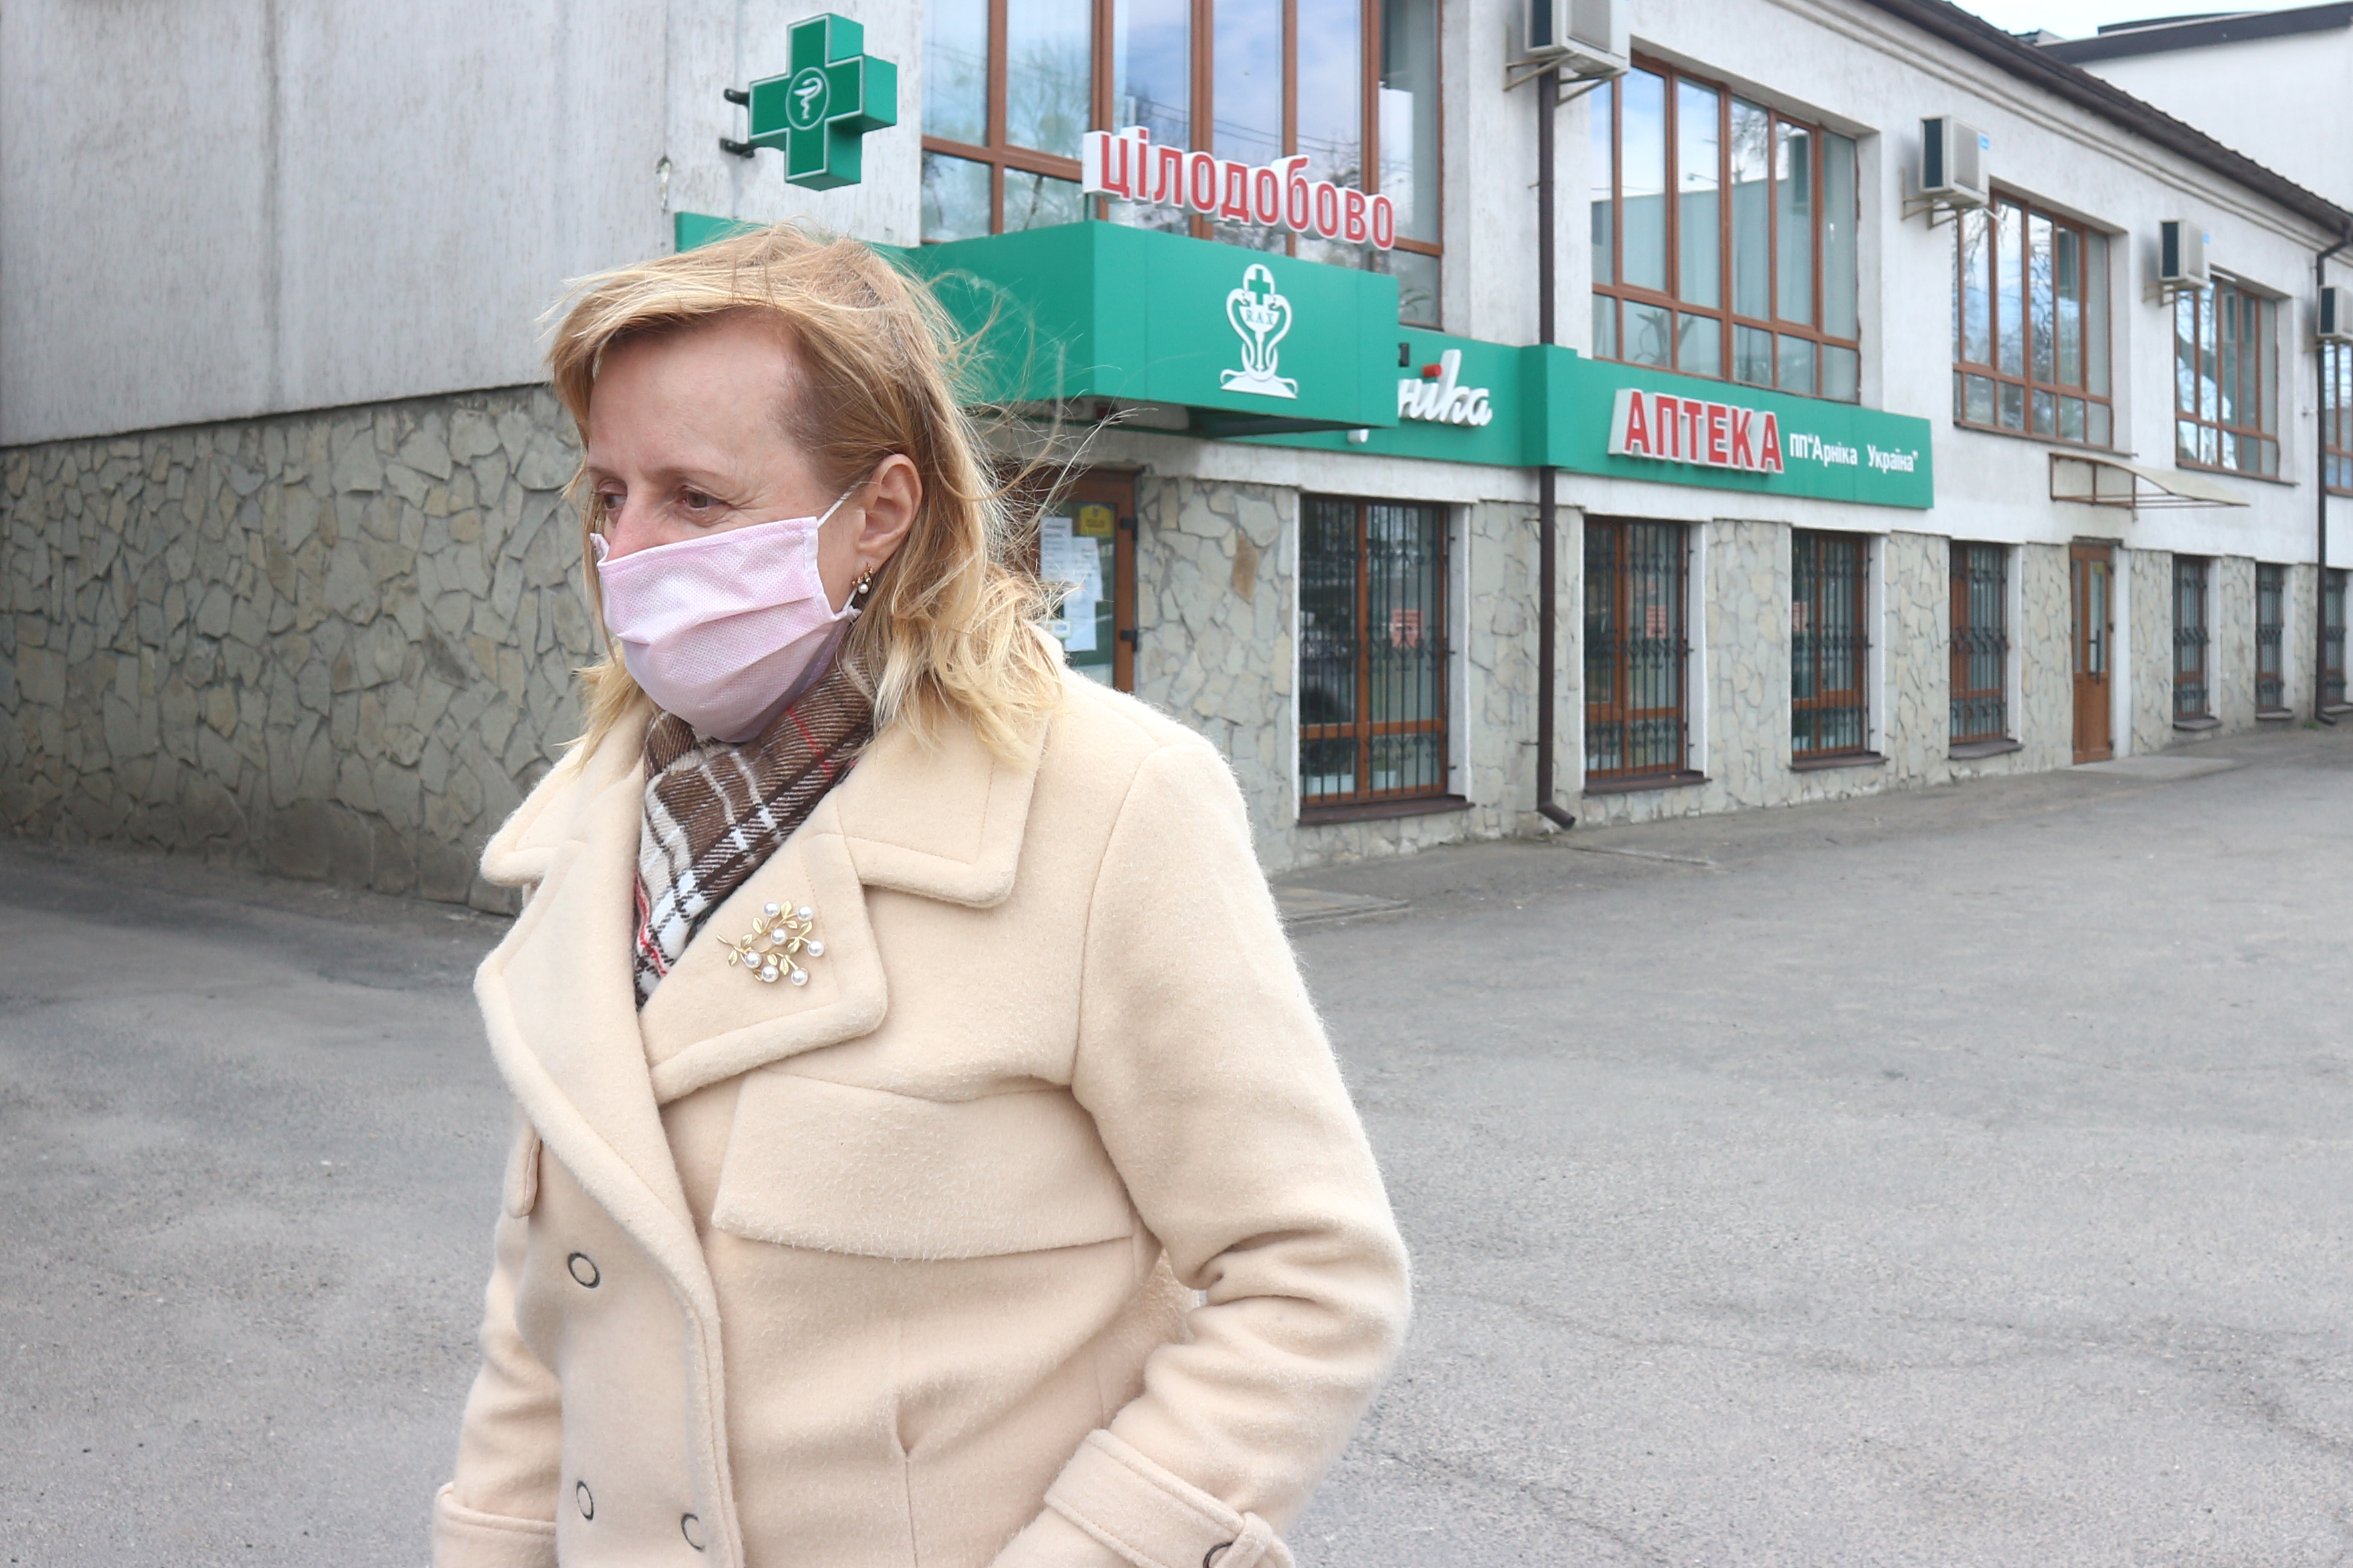 Ukrainian Christians struggle with COVID-19